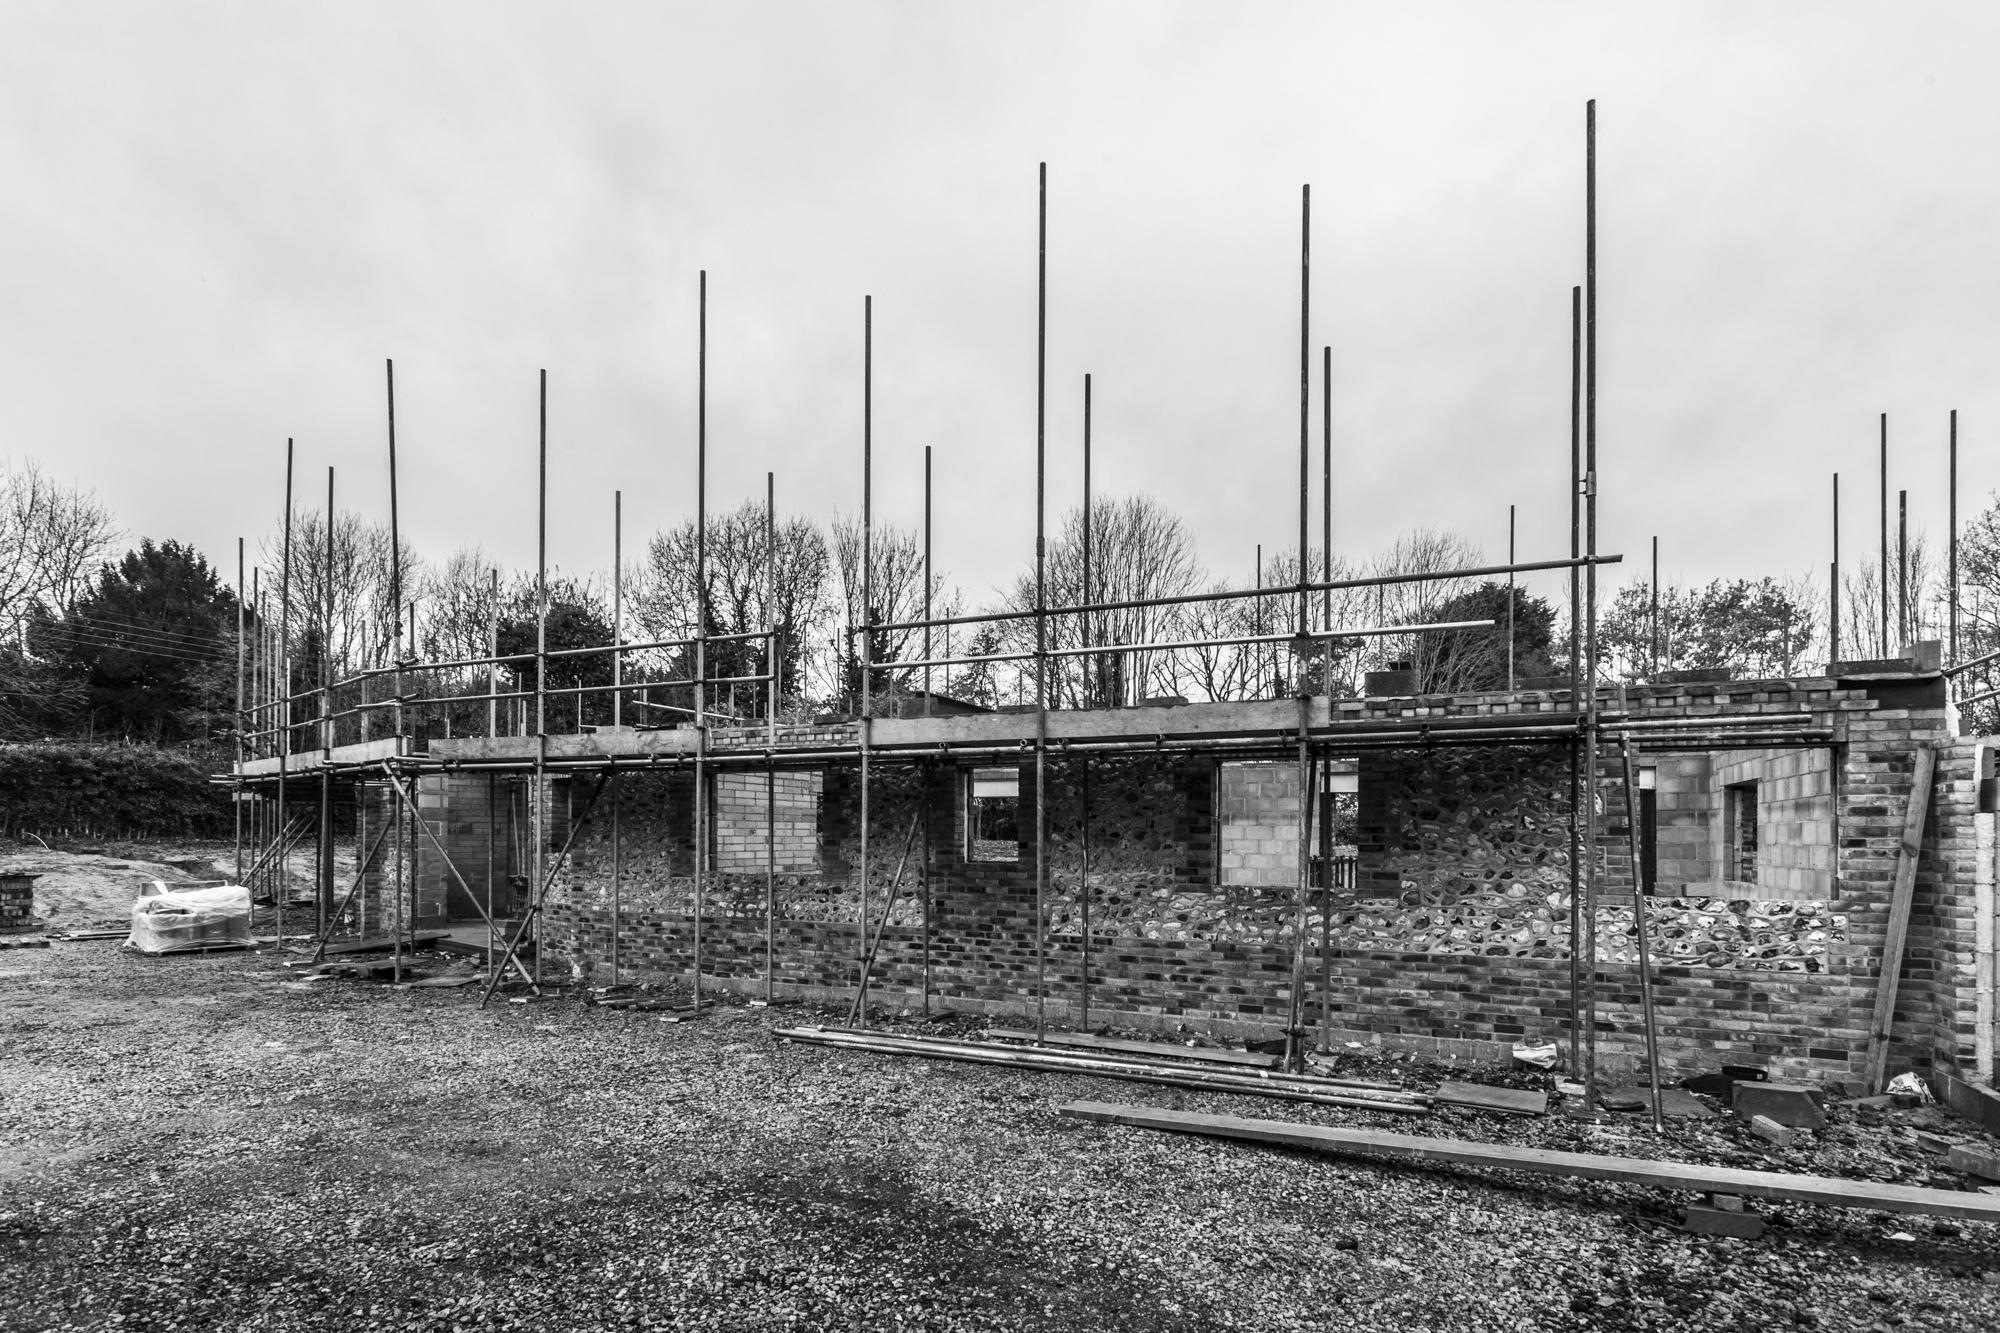 FlinthurstHouse_Construction_22.jpg